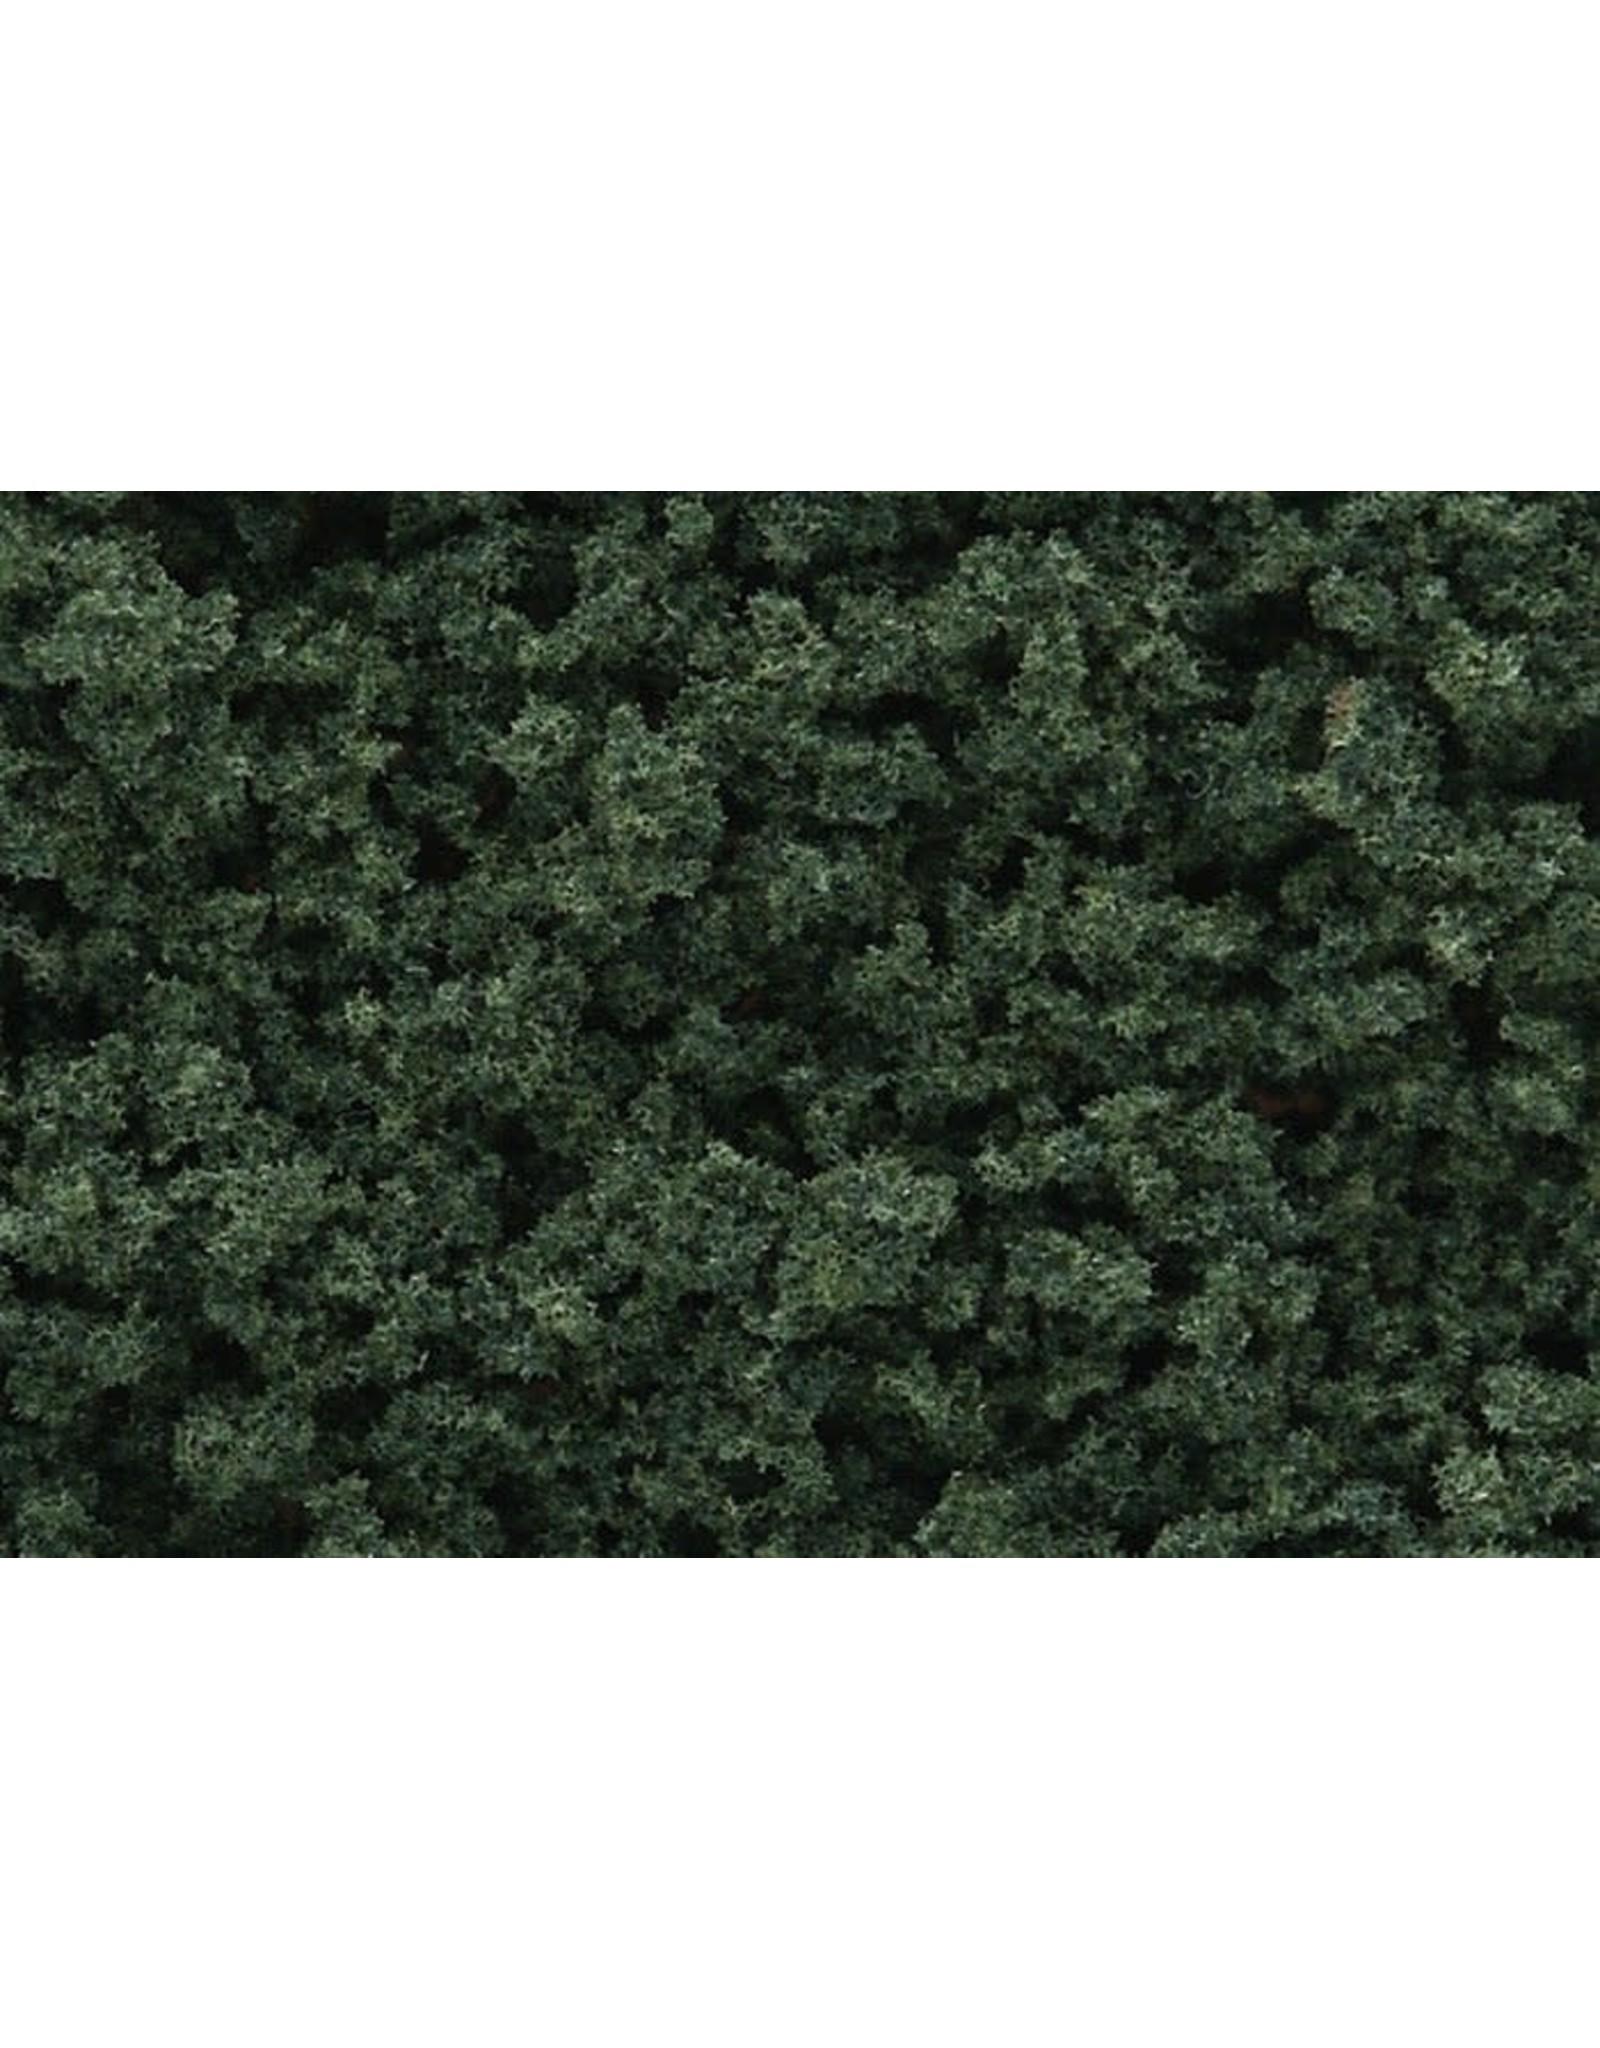 Woodland Scenics Underbrush Dark Green FC1637